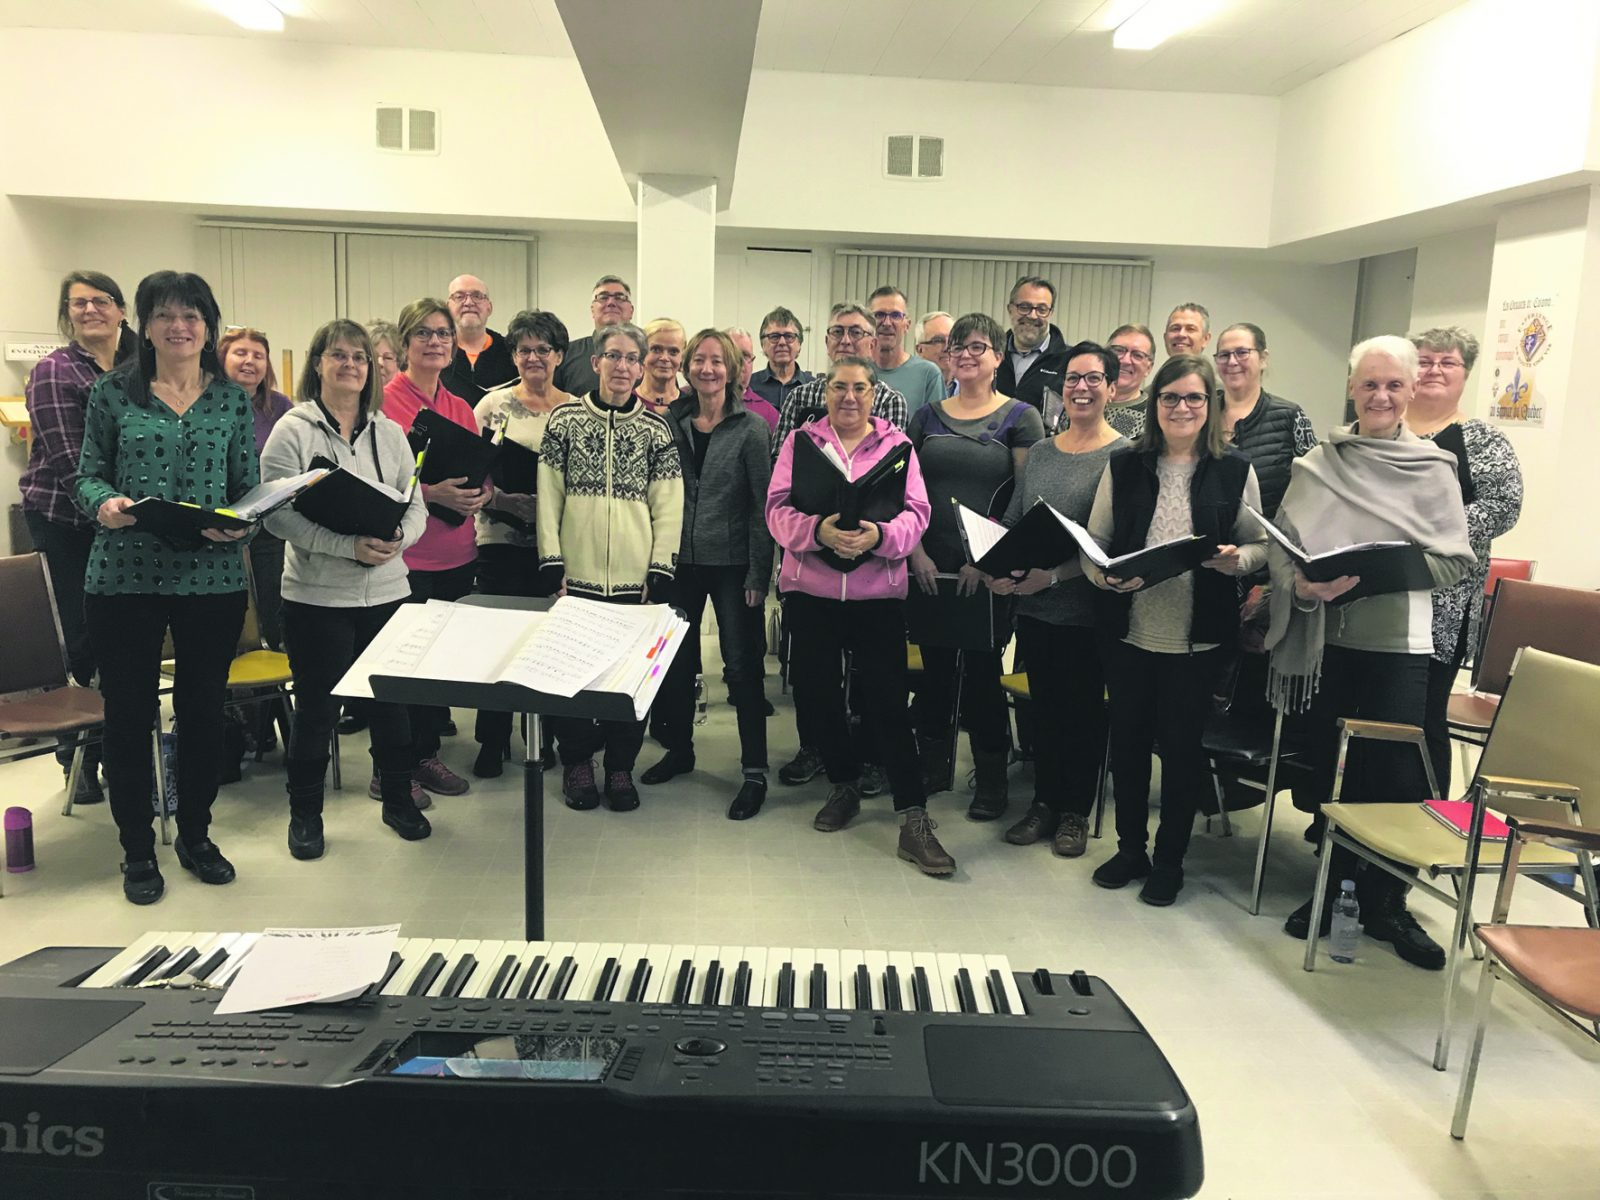 La chorale Sainte-Amélie chantera bientôt Noël